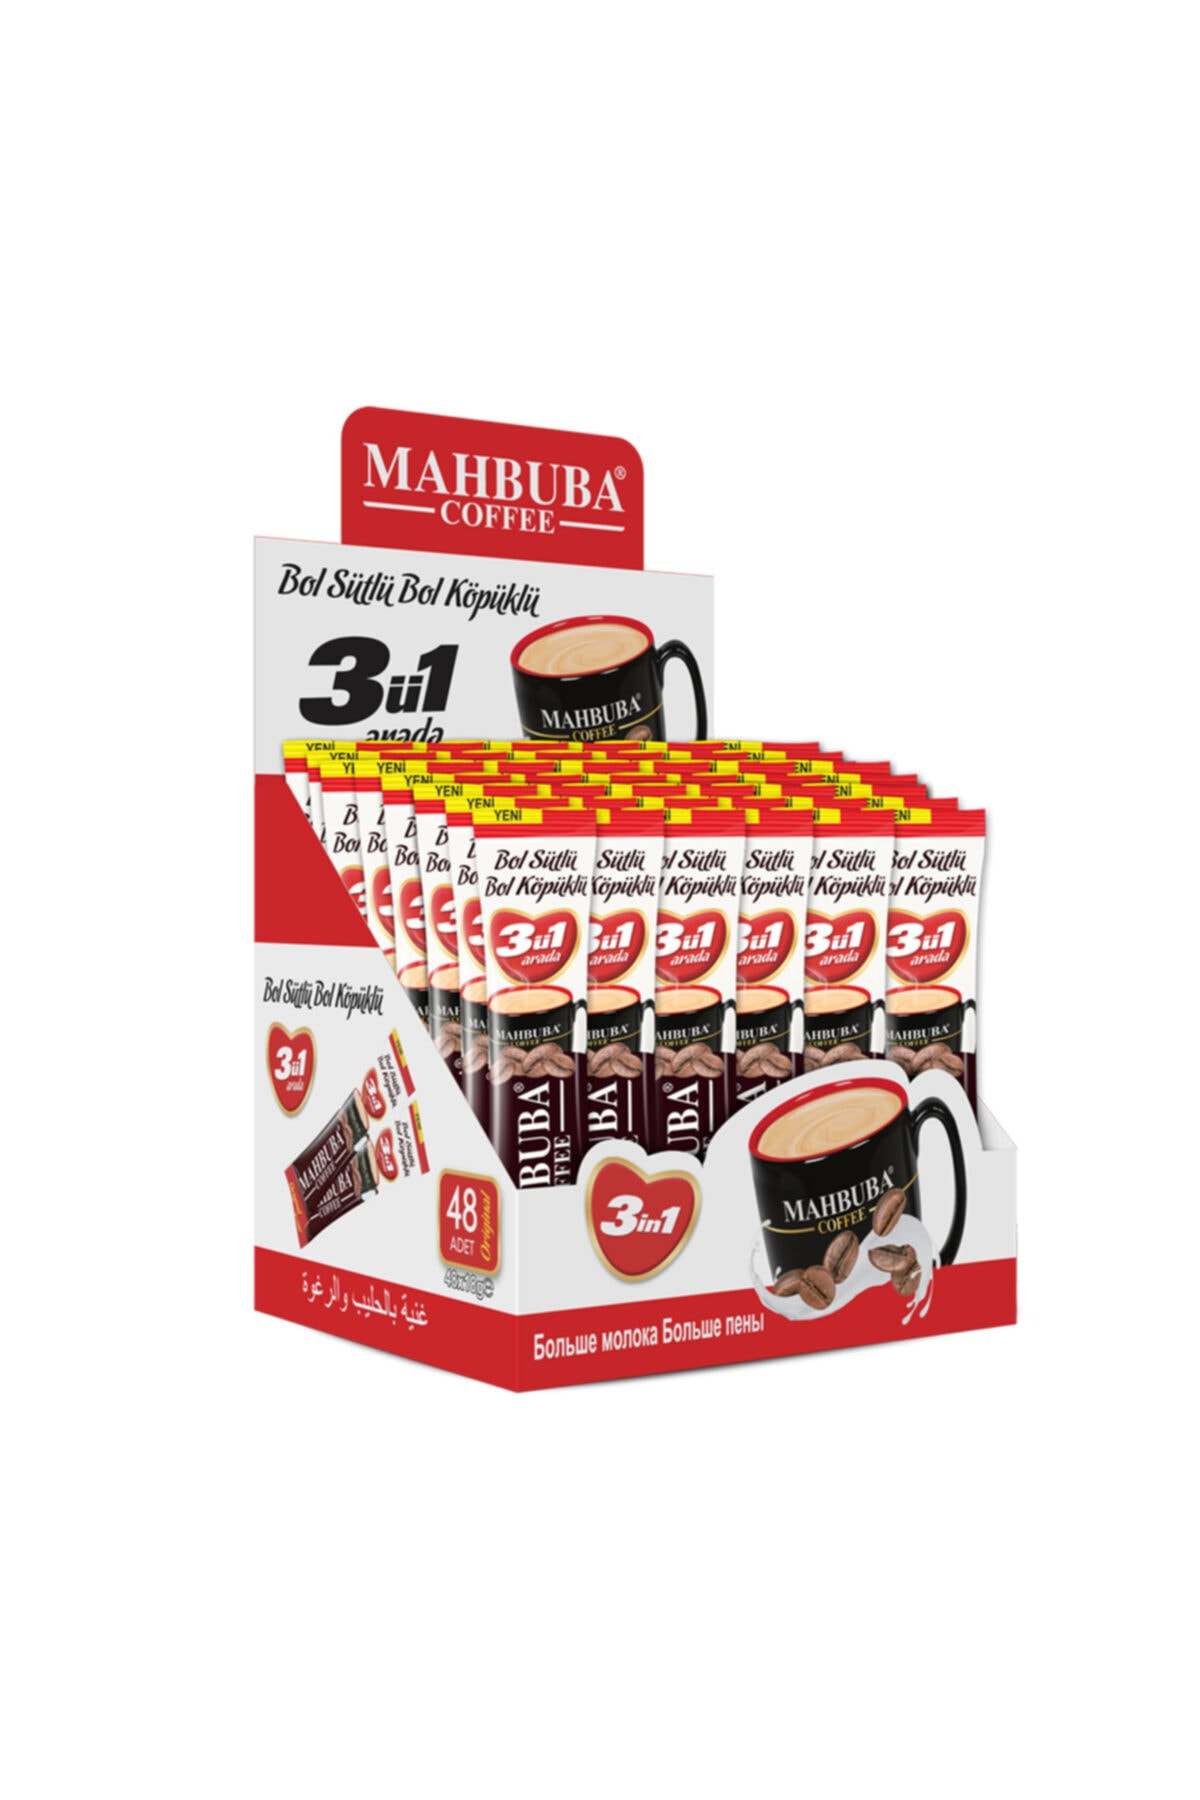 Mahbuba Bol Sütlü Bol Köpüklü Kahve 3.1 Arada 48 Adet x 18 gr 1